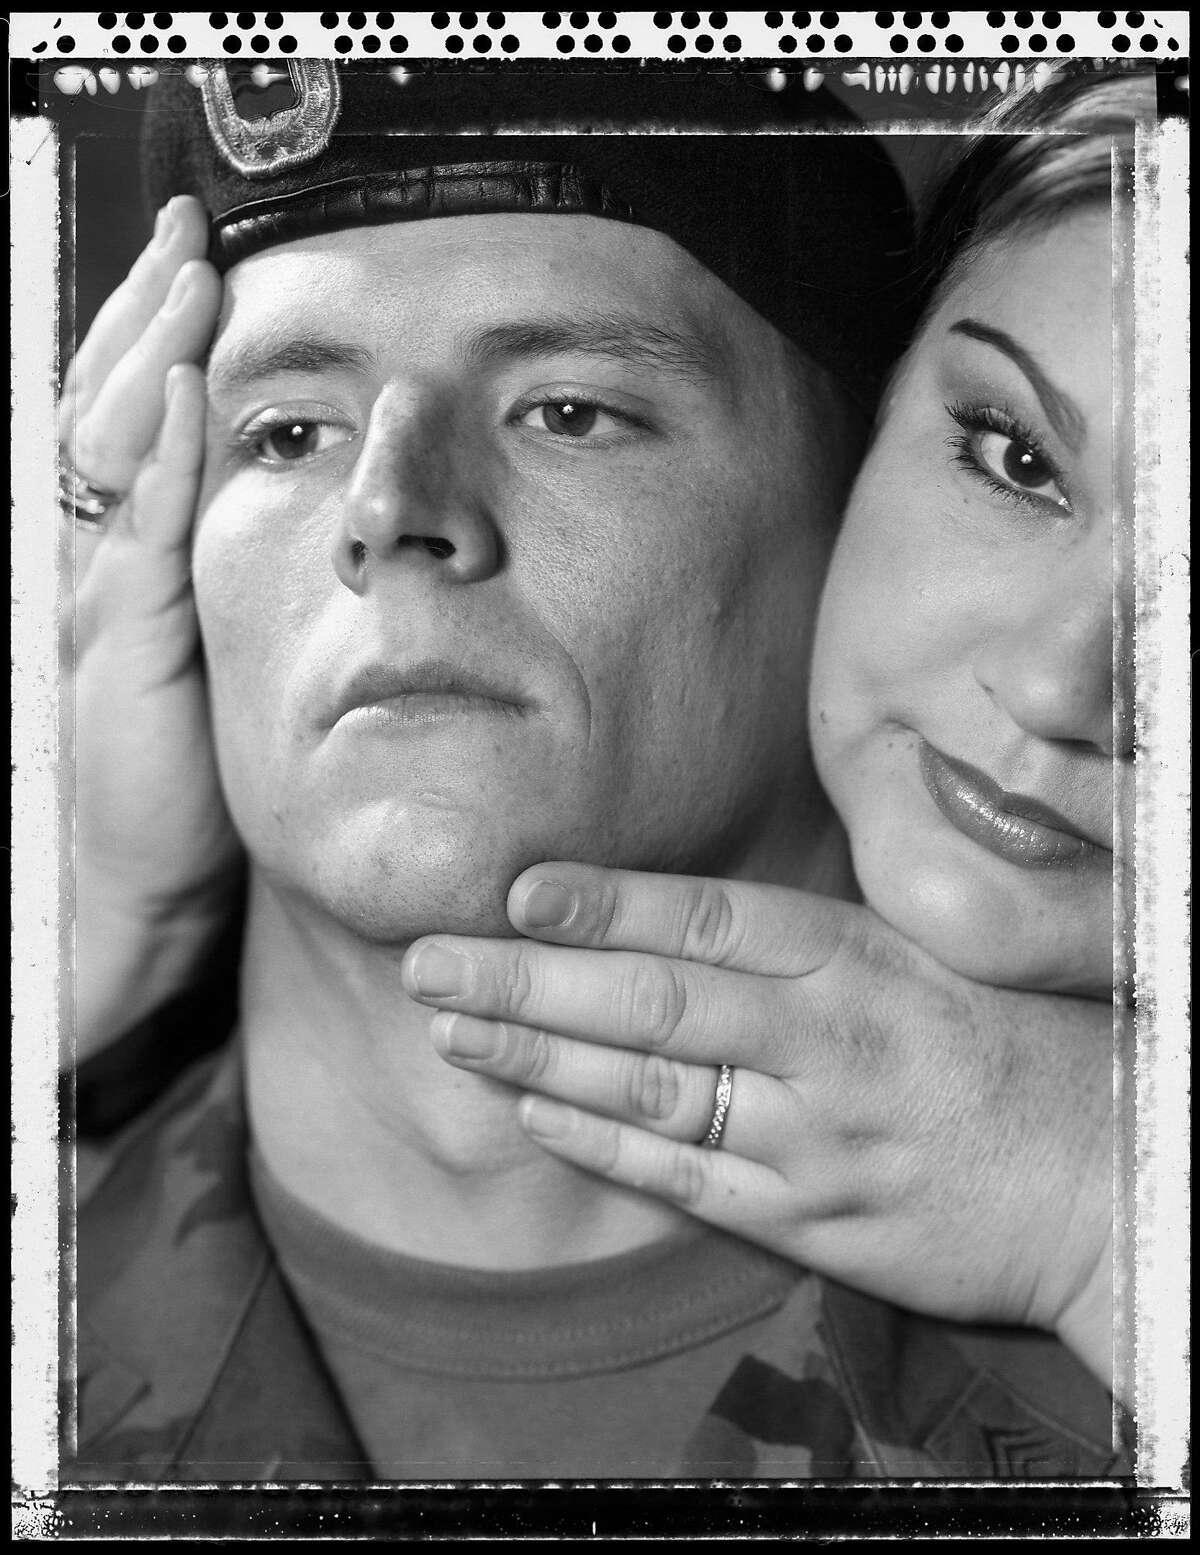 Photo Credit: Suzanne Opton, Hipwell � 382 Days in Iraq, 2005